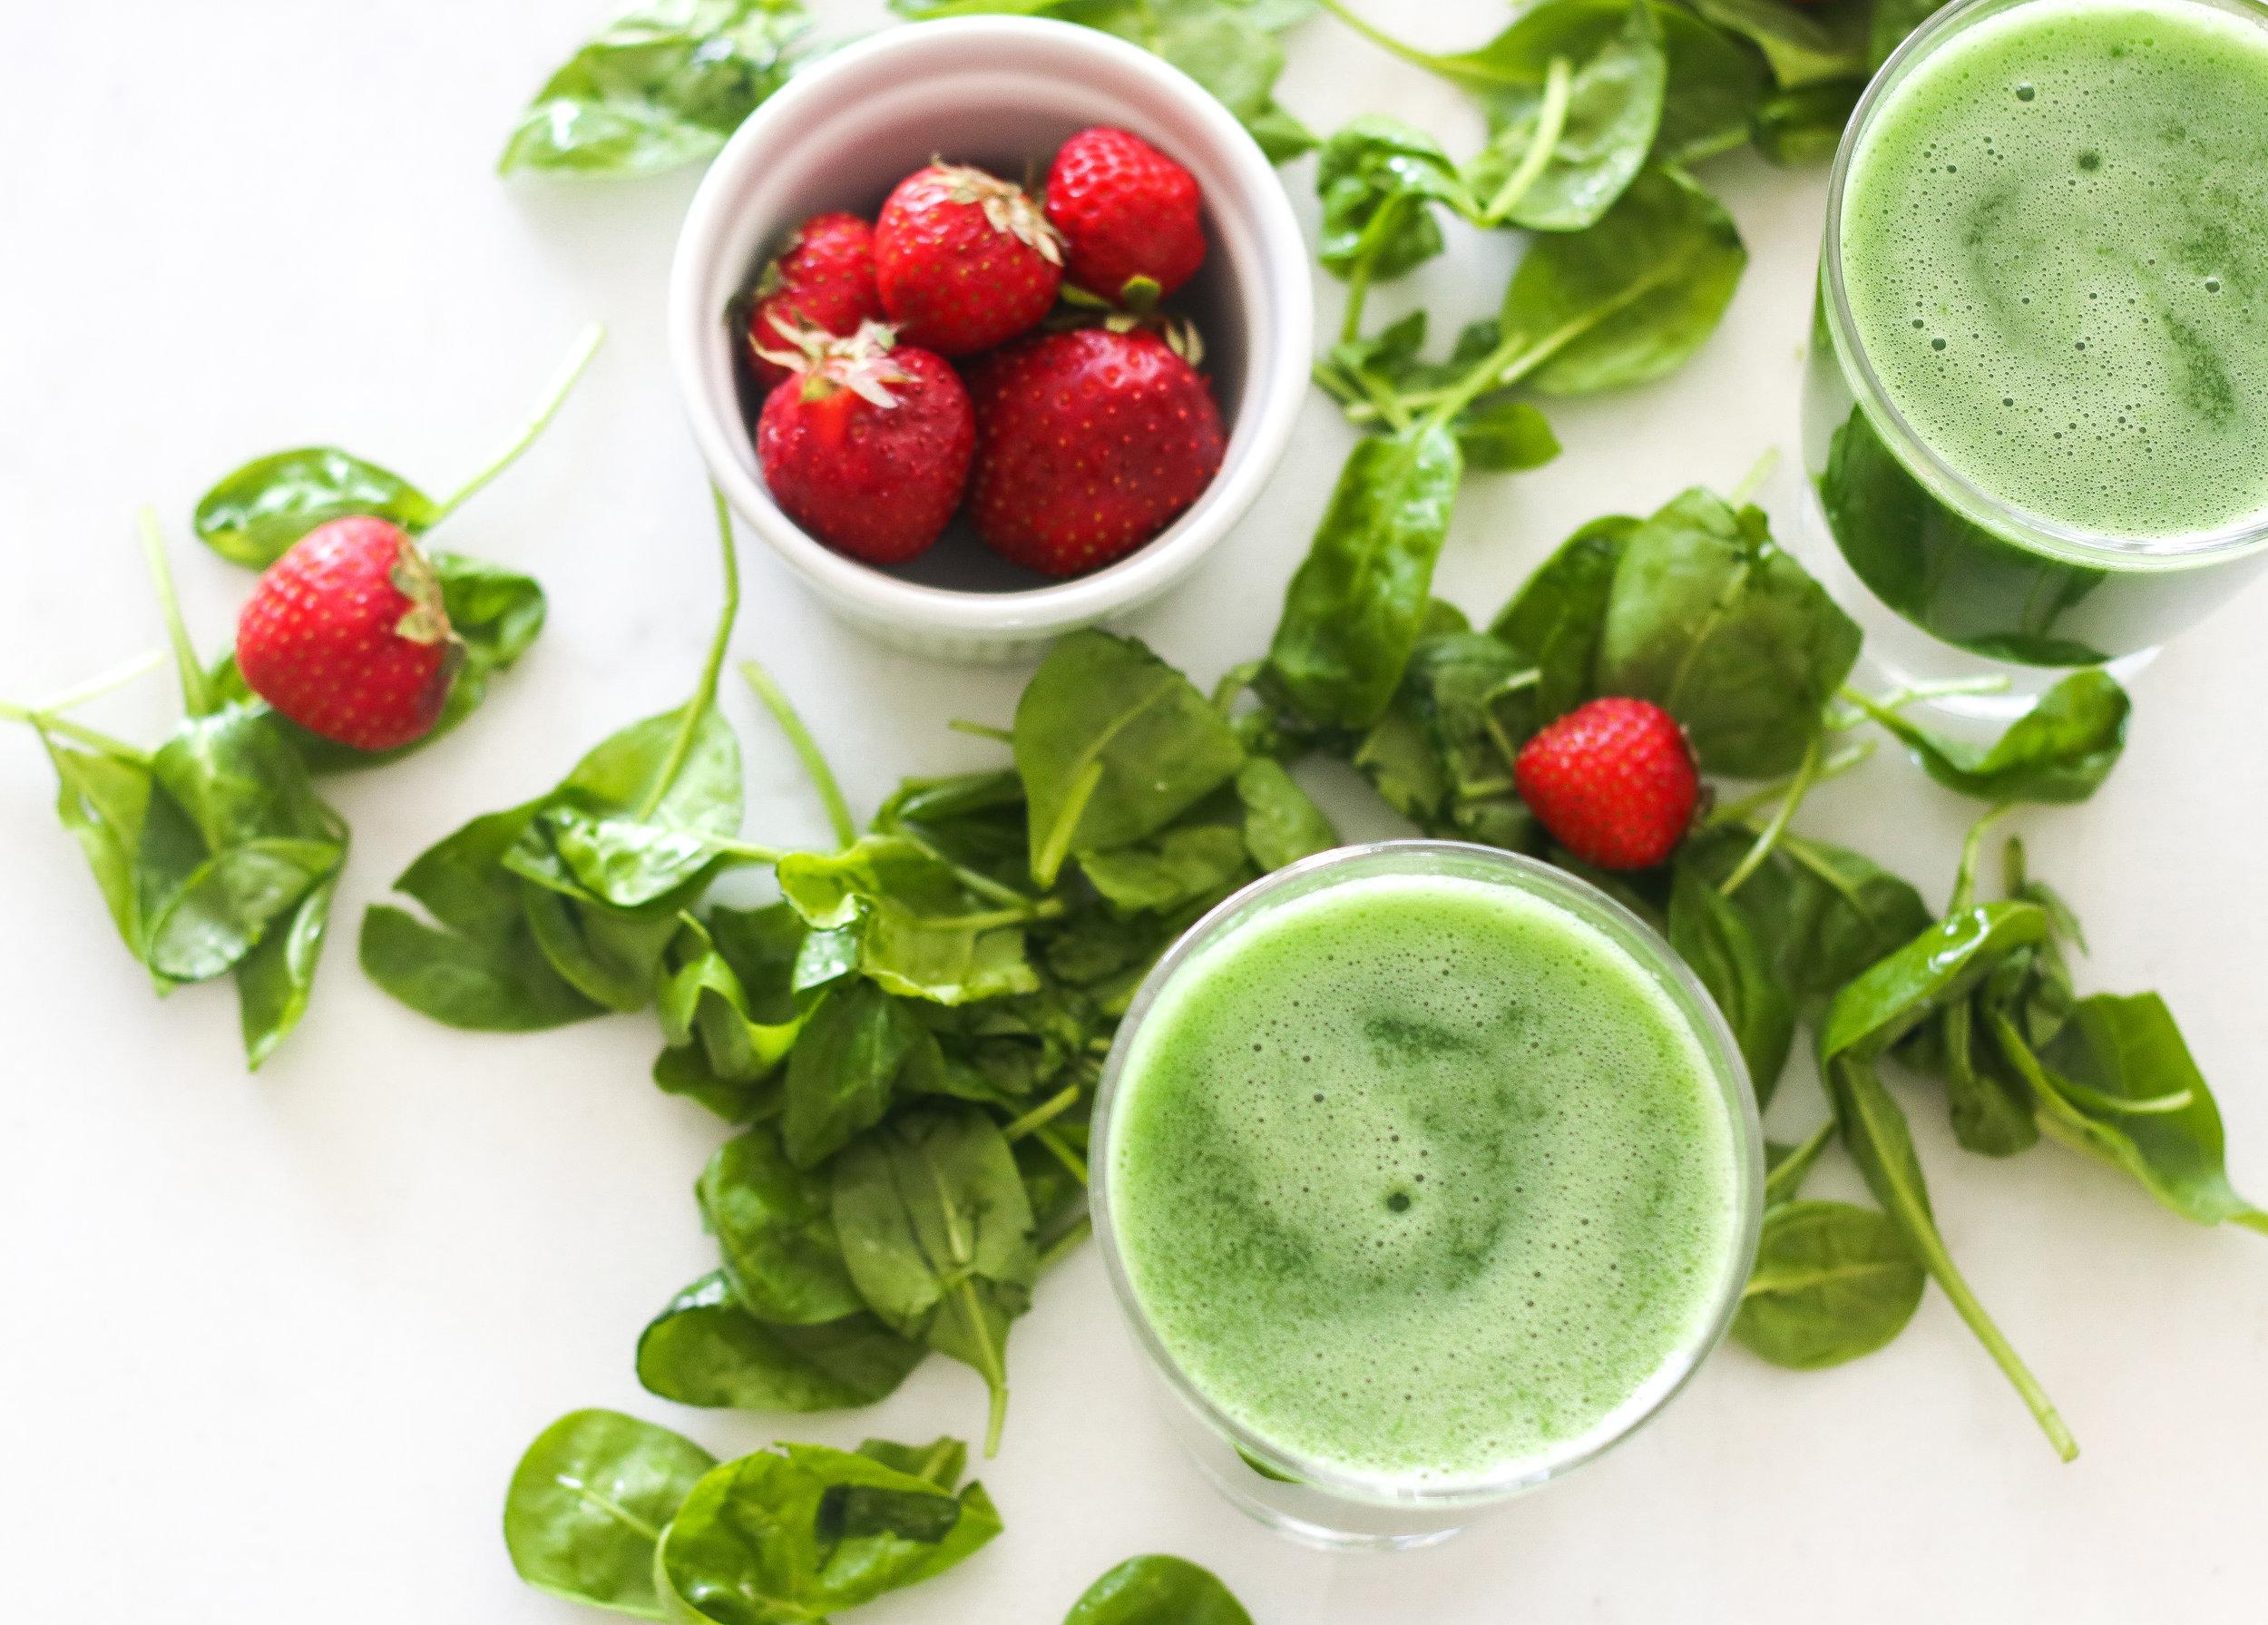 The health benefits of chlorella www.lindahaggh.com.jpg